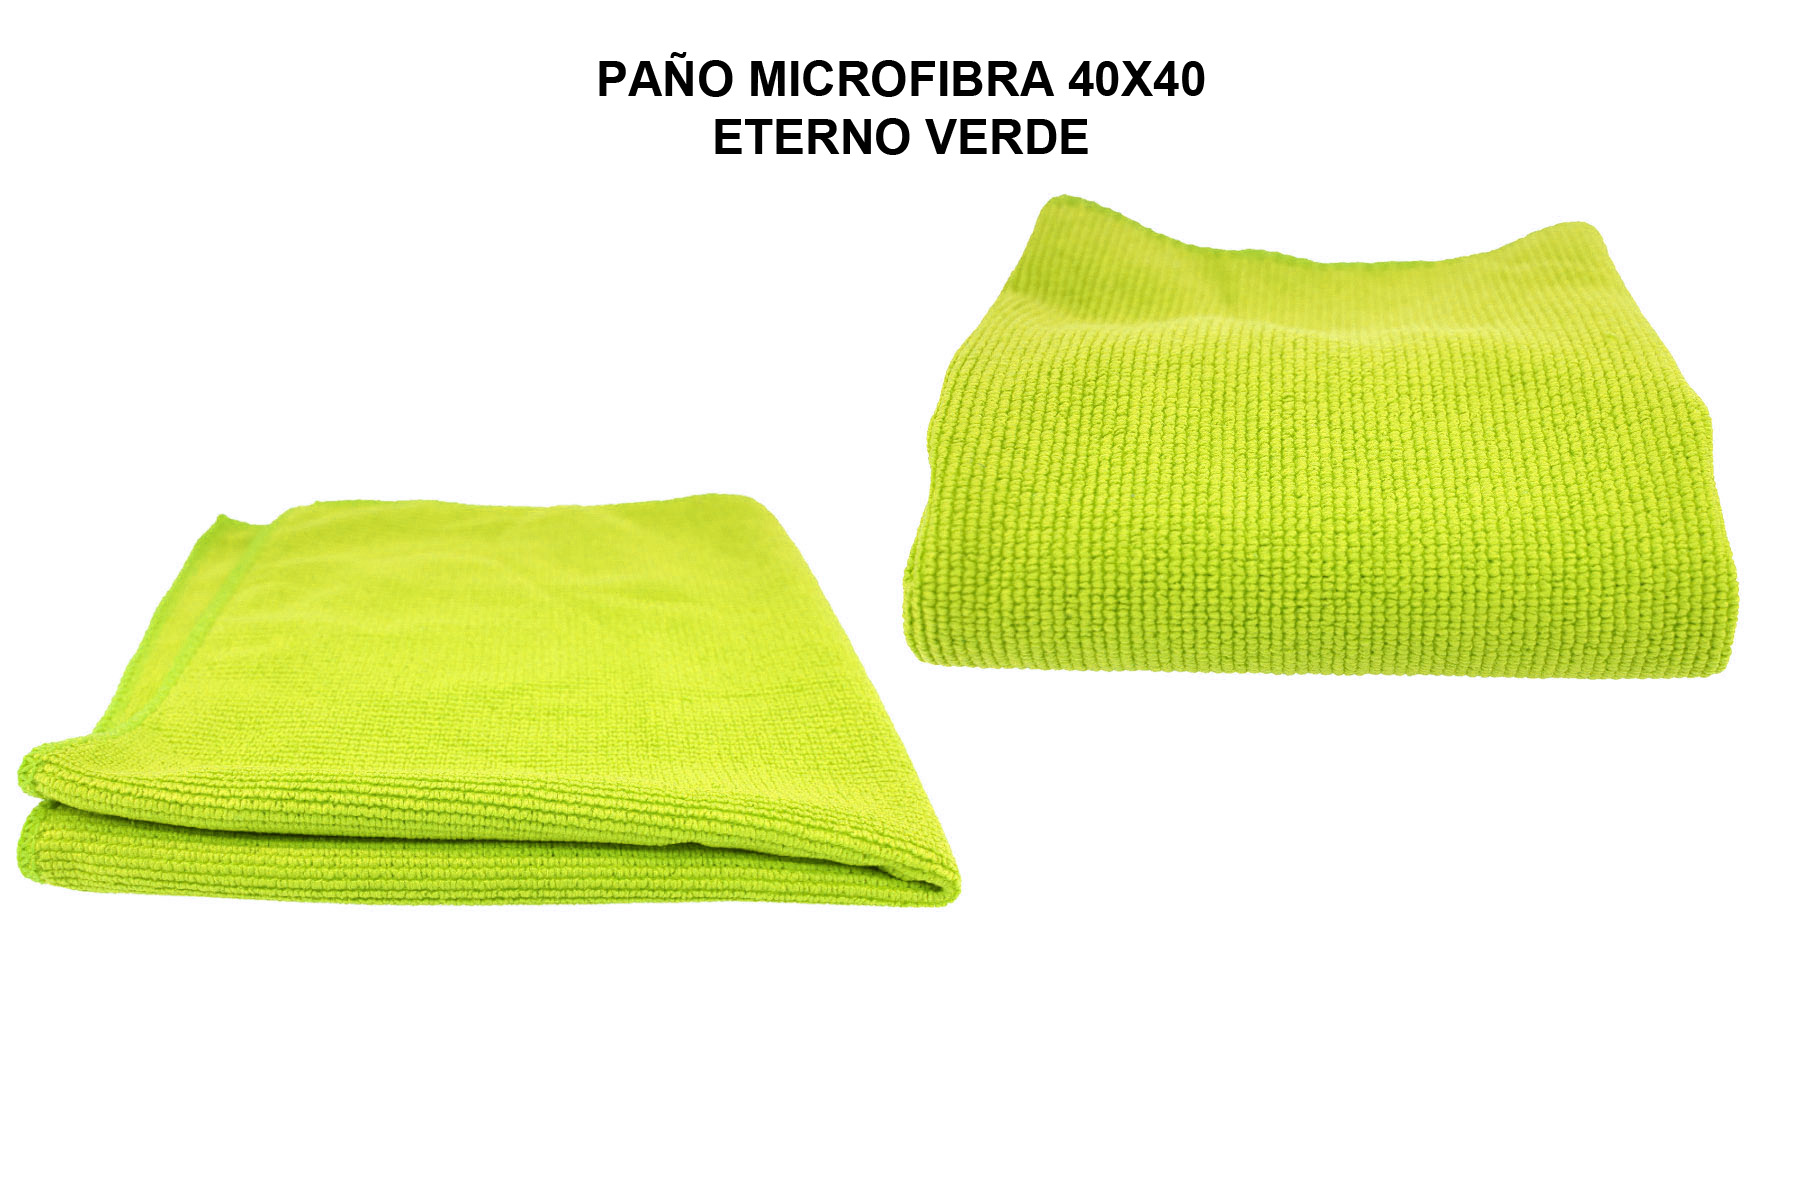 PAÑO MICROFIBRA 40X40 ETERNO VERDE